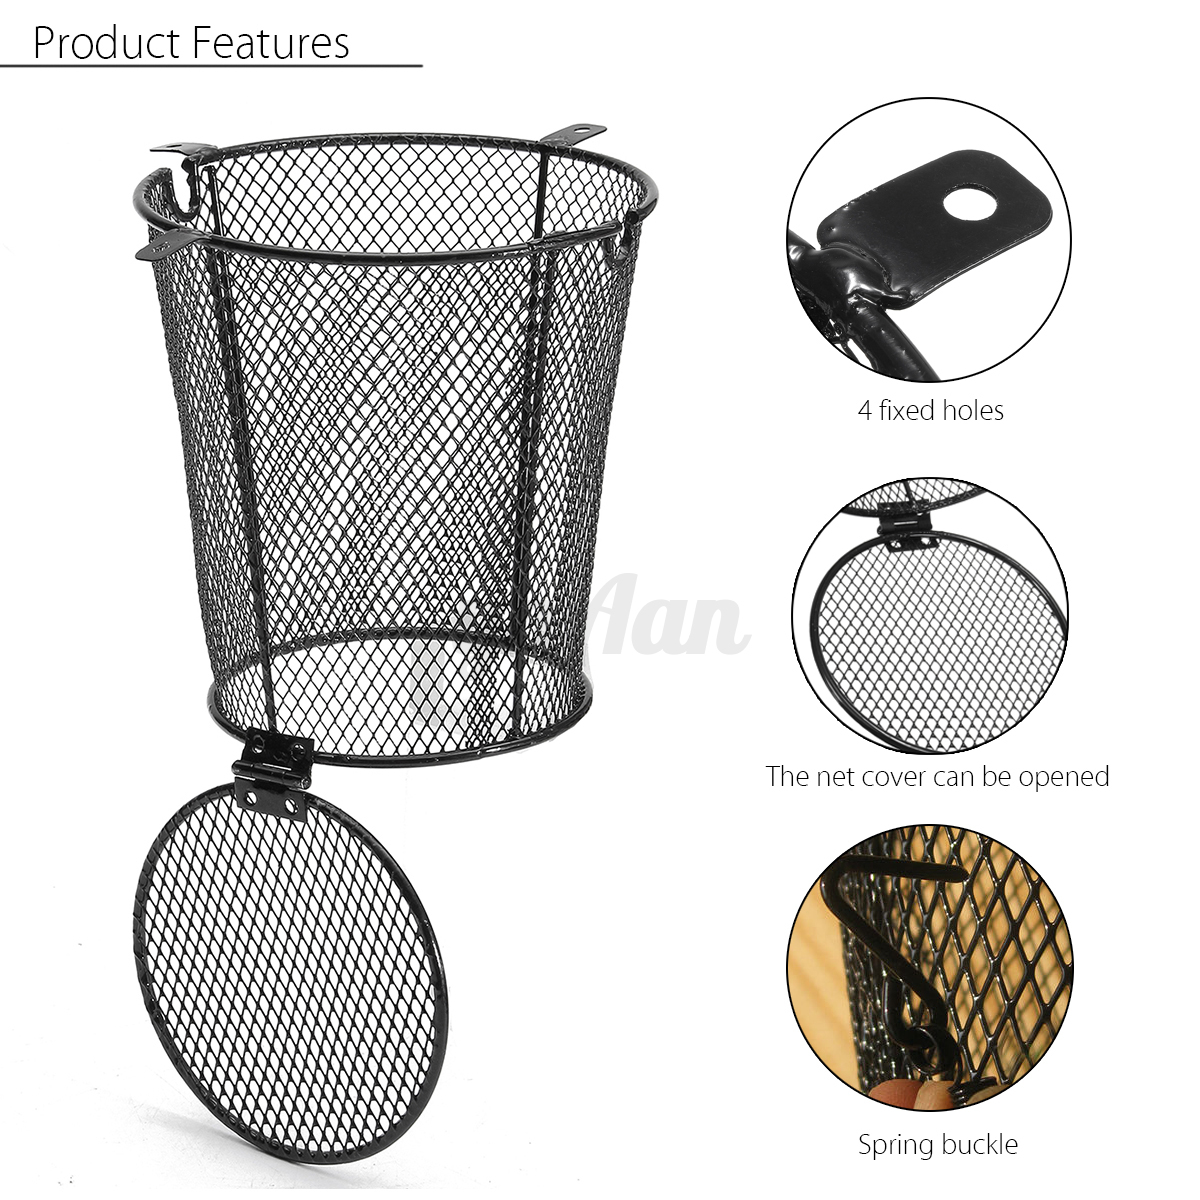 reptile vivarium light lamp shade bulb heater guard. Black Bedroom Furniture Sets. Home Design Ideas